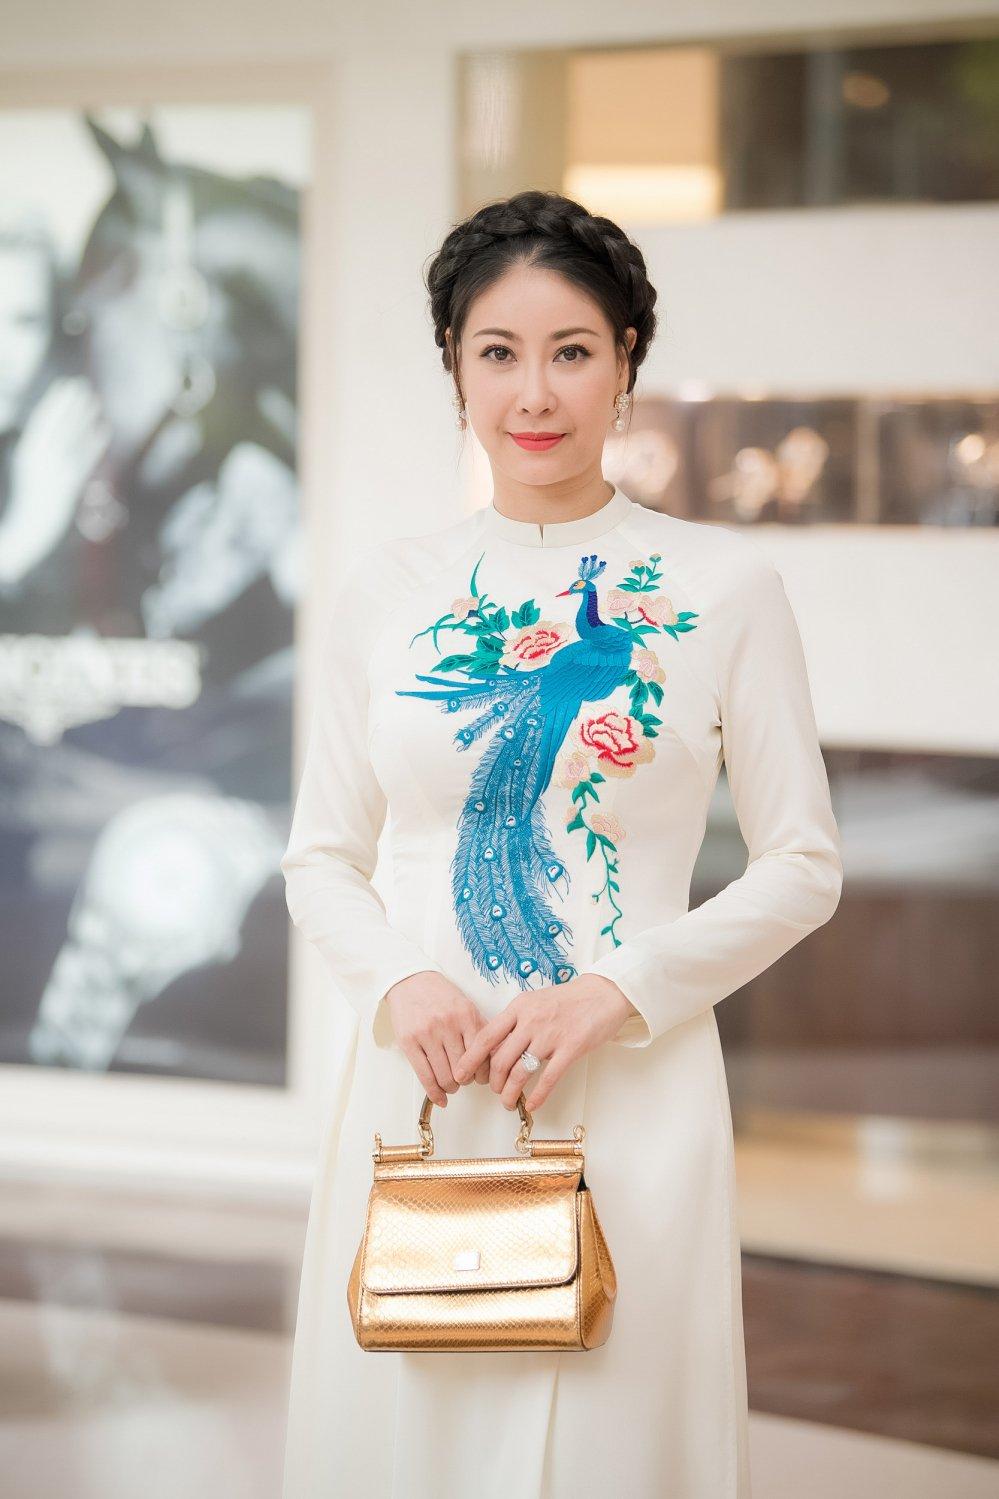 Hoa hau Viet Nam 2018 khang dinh khong bo phan thi bikini hinh anh 2